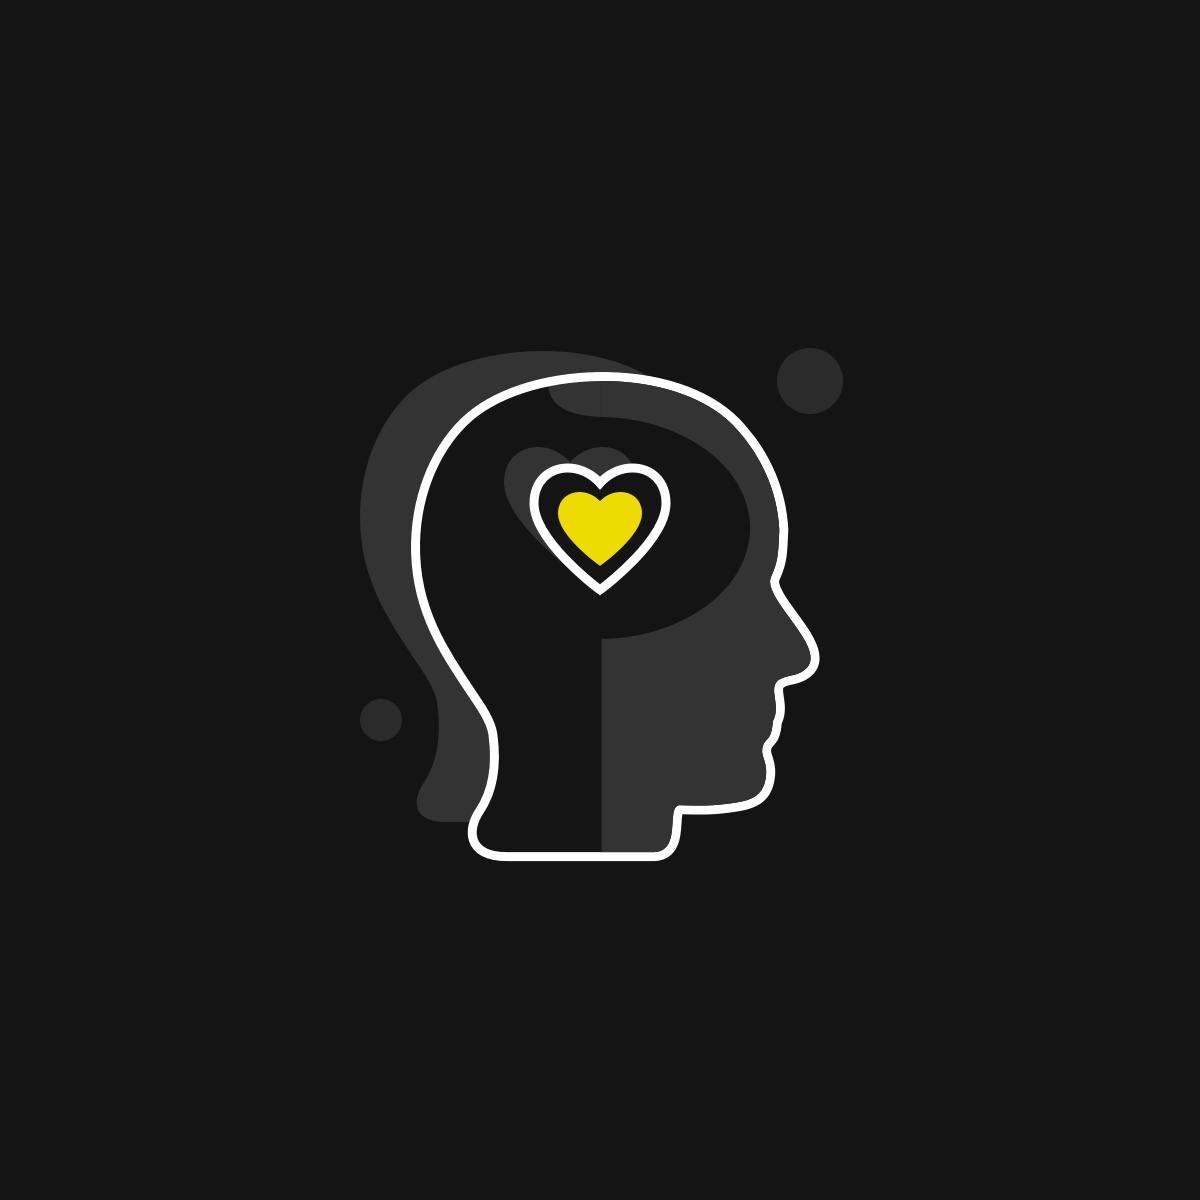 GRAY-lz-icon-empathie-black-yellow-square@3x